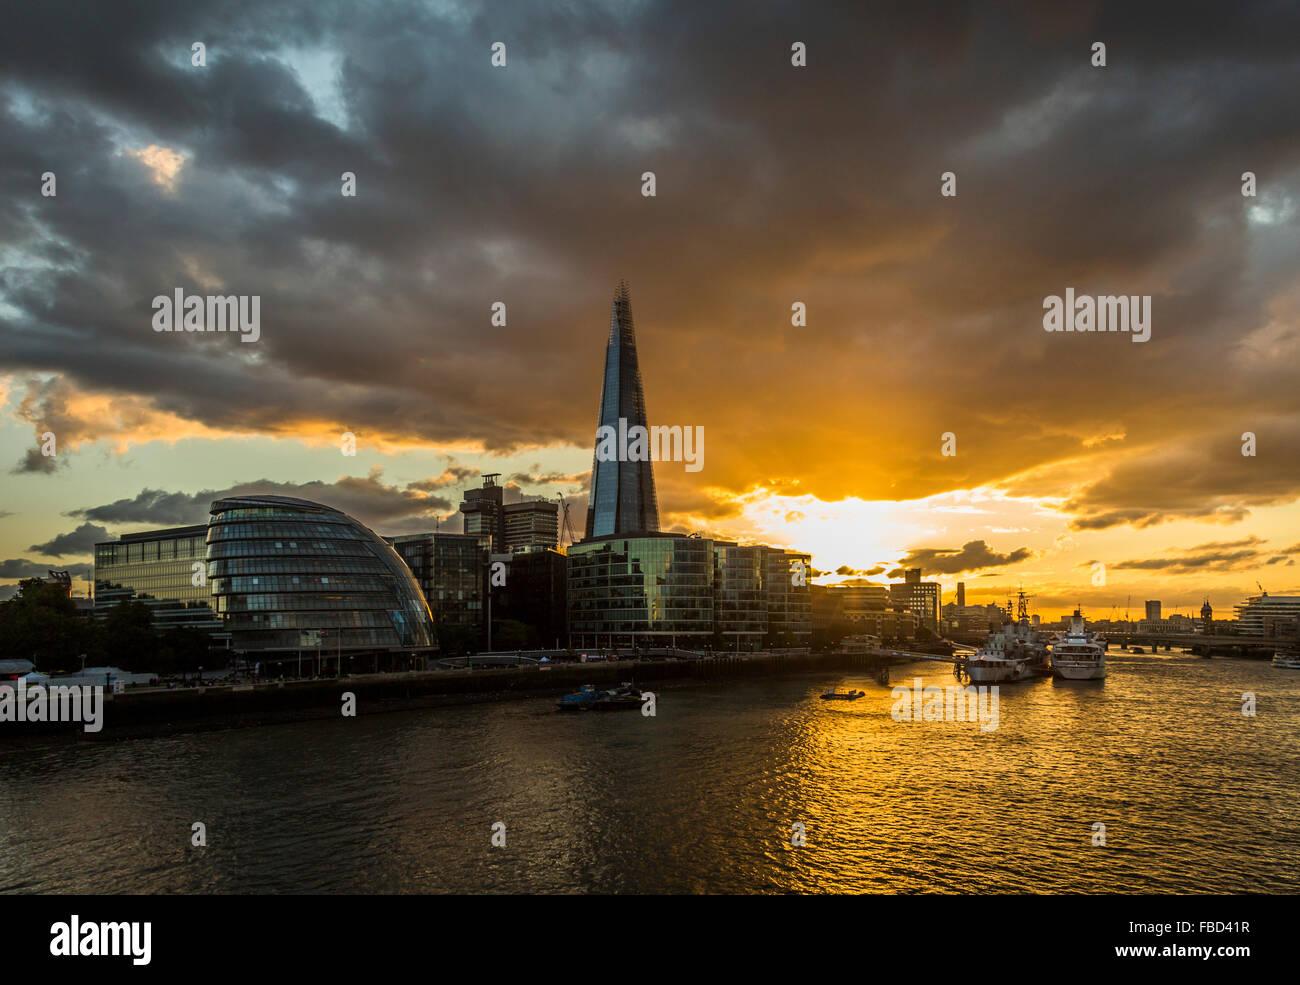 The City Hall and The Shard, London, United Kingdom - Stock Image